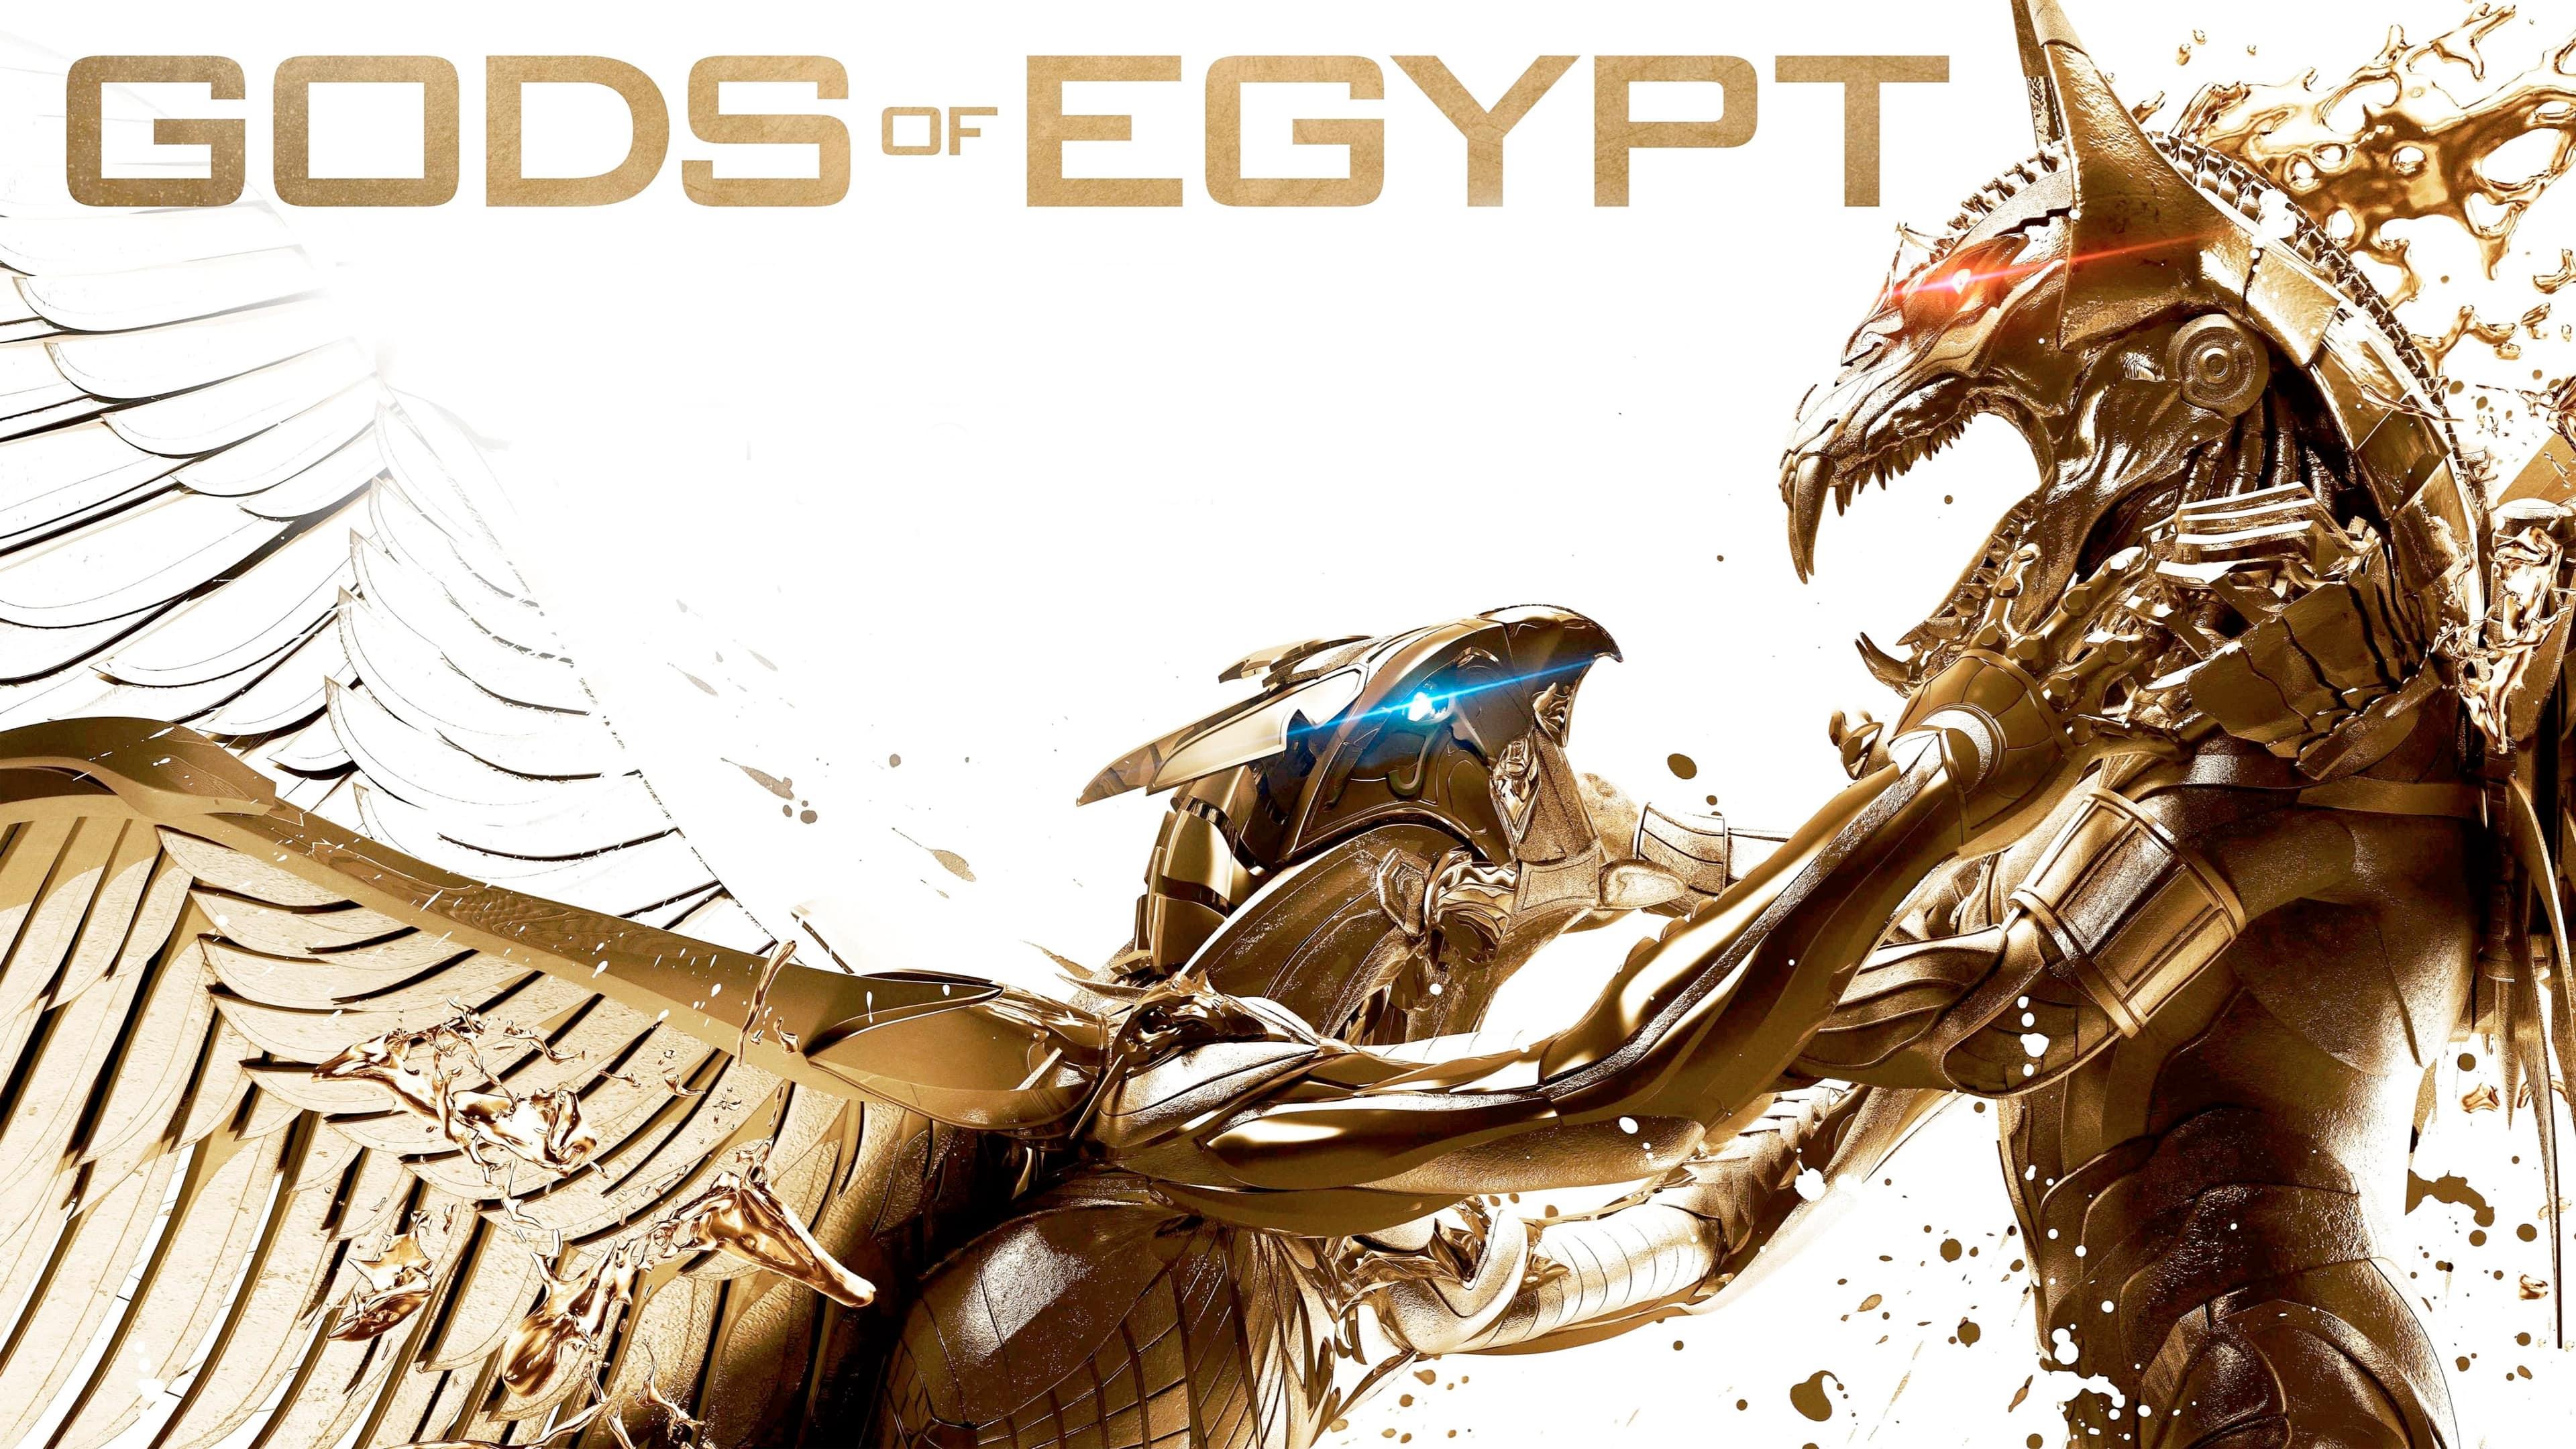 Gods of Egypt Wallpapers